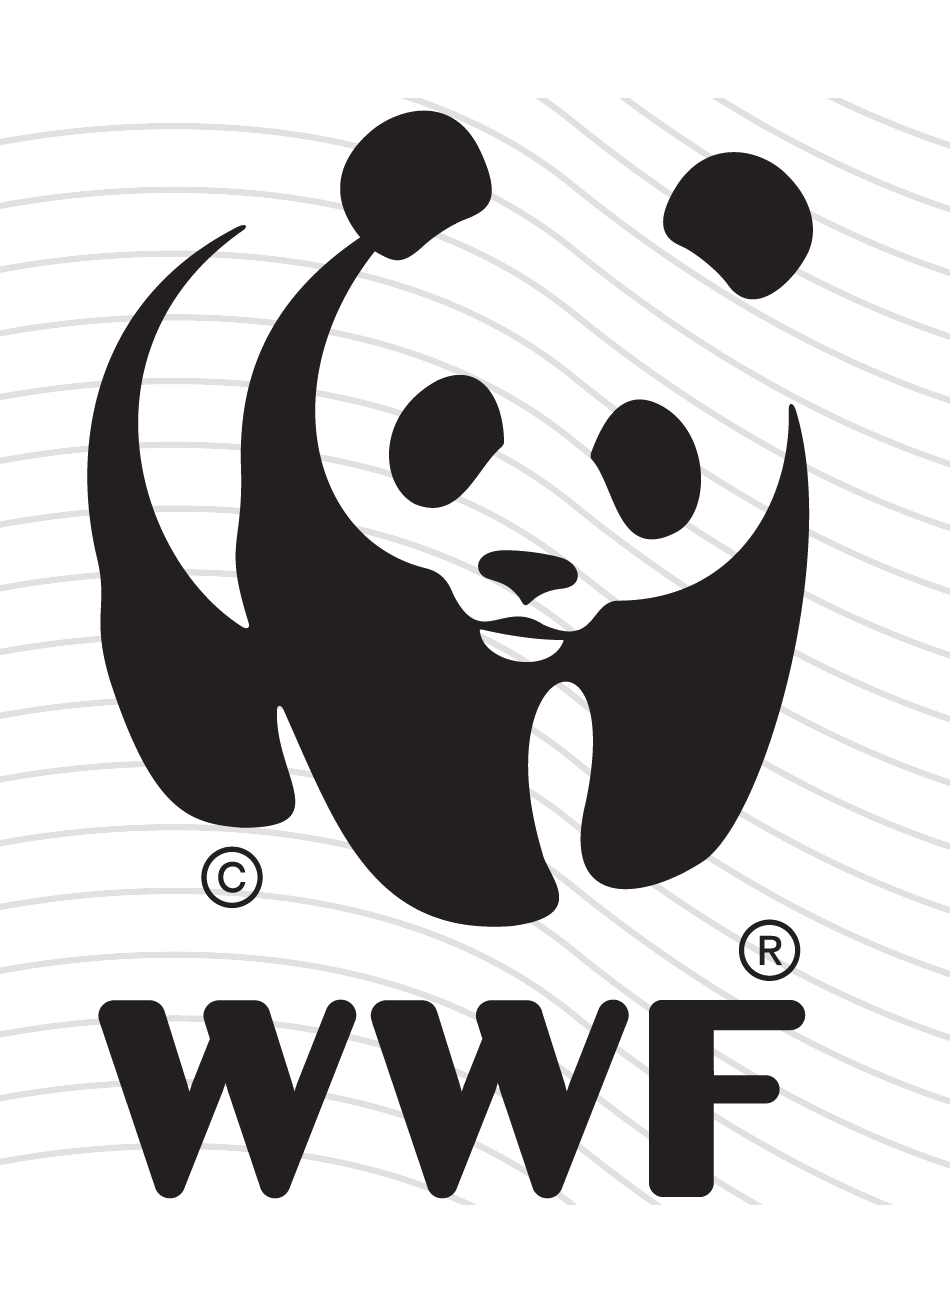 Vi støtter Verdensnaturfonden